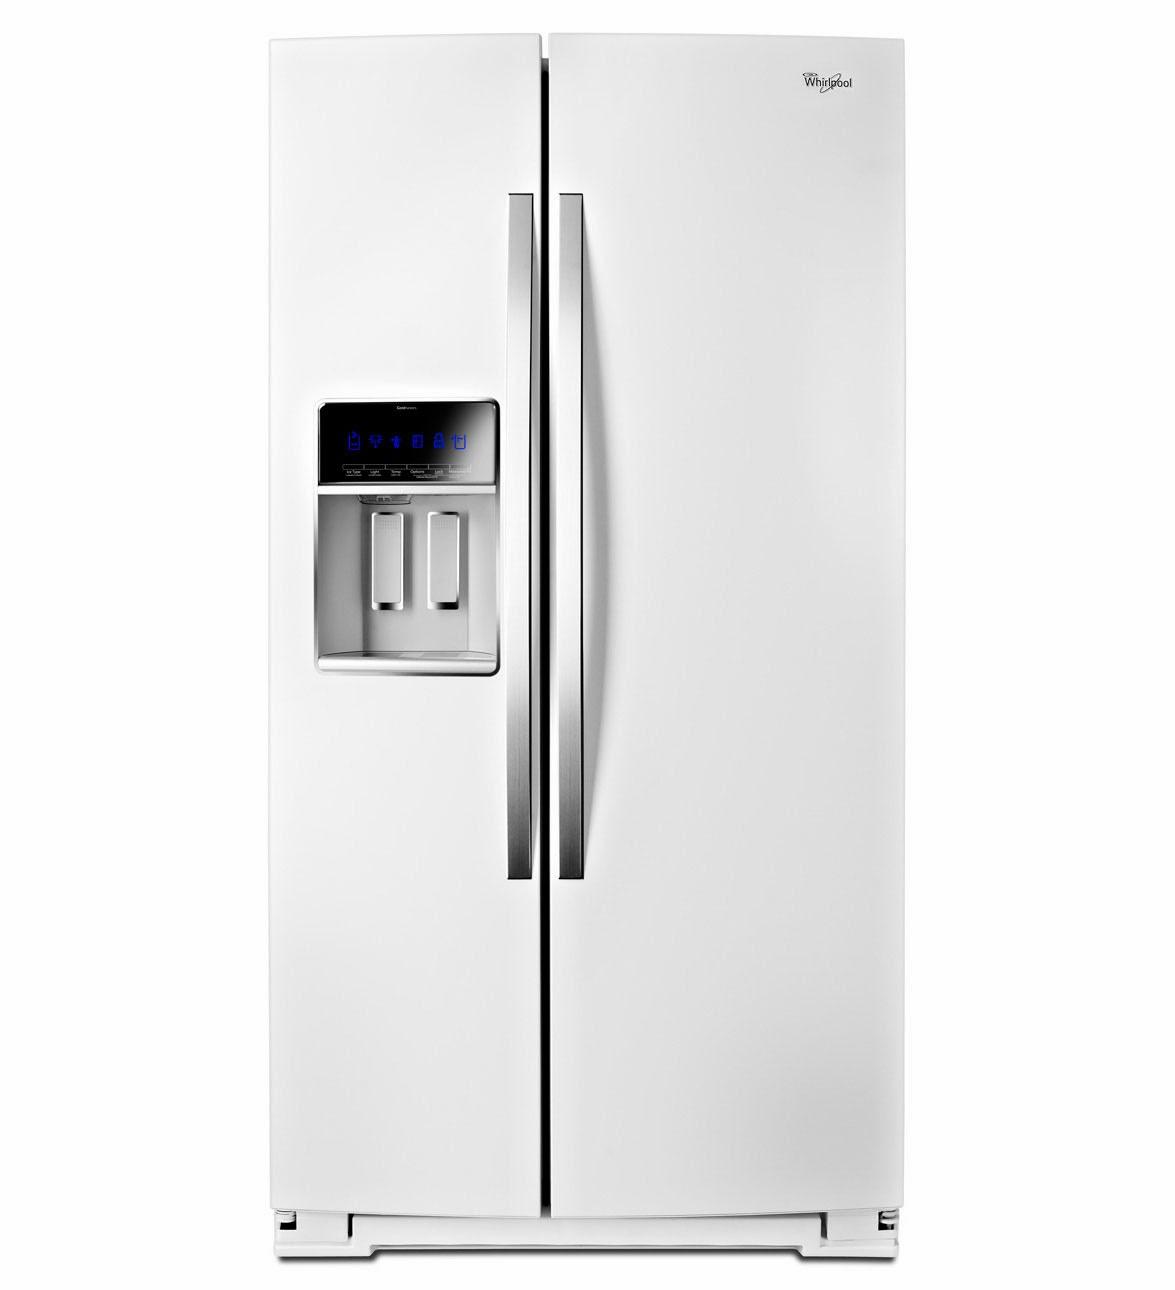 Whirlpool Refrigerator Brand Counter Depth Wrs965ciah